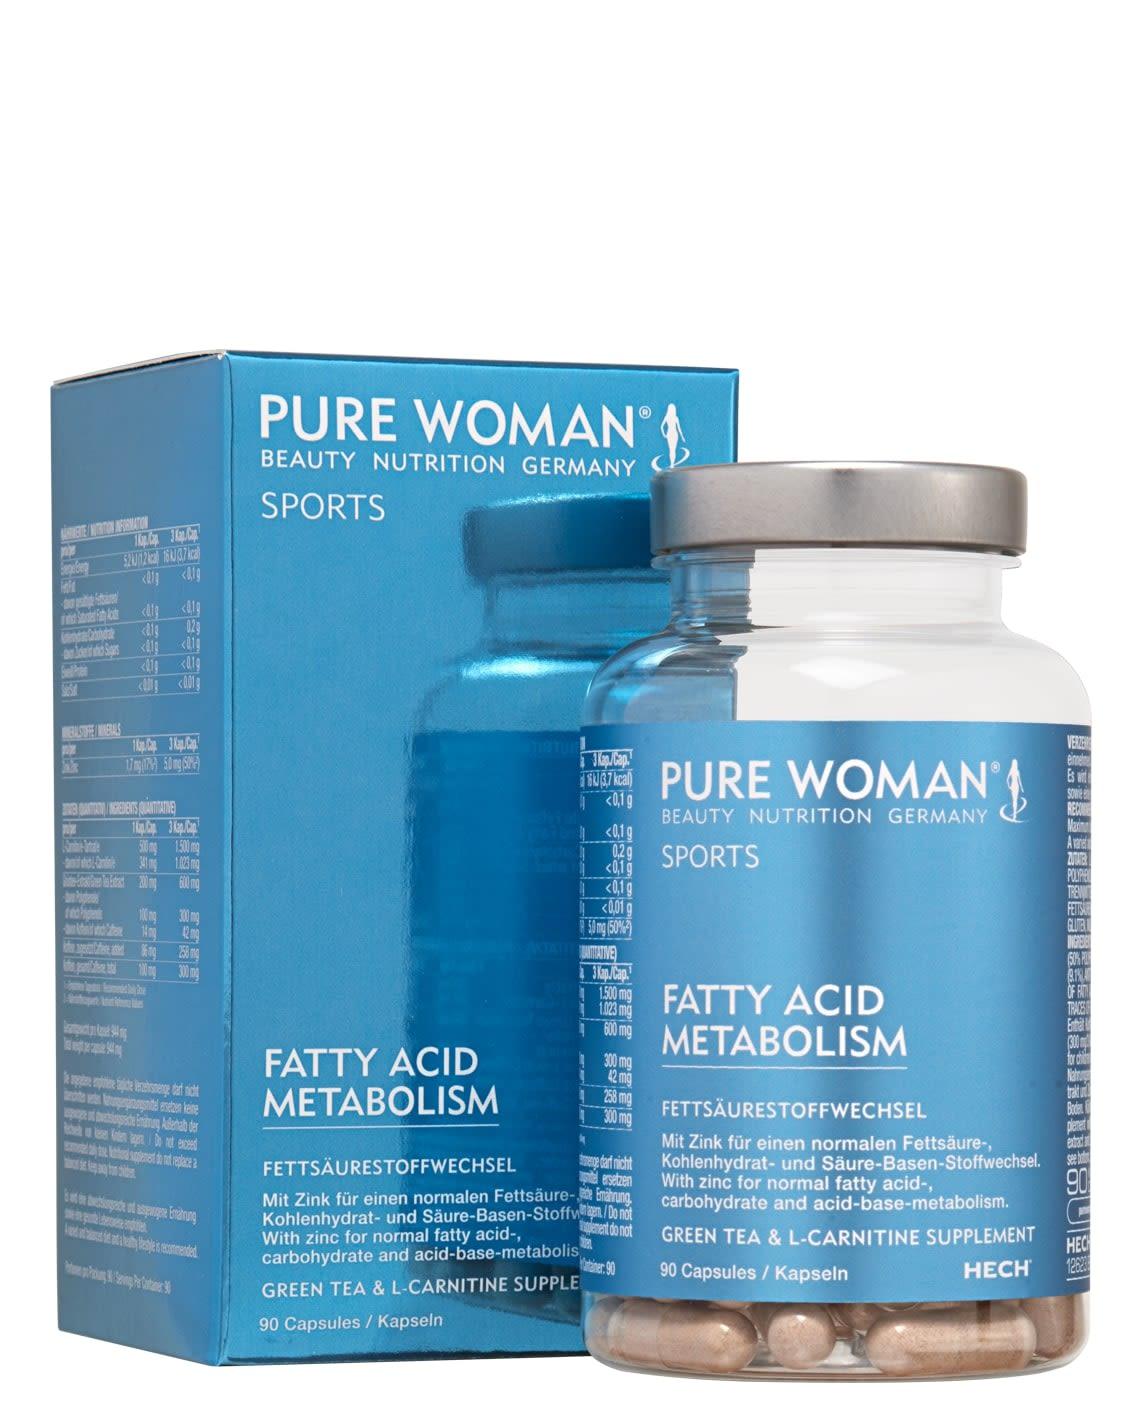 Fatty Acid Metabolism (90 Kapseln)